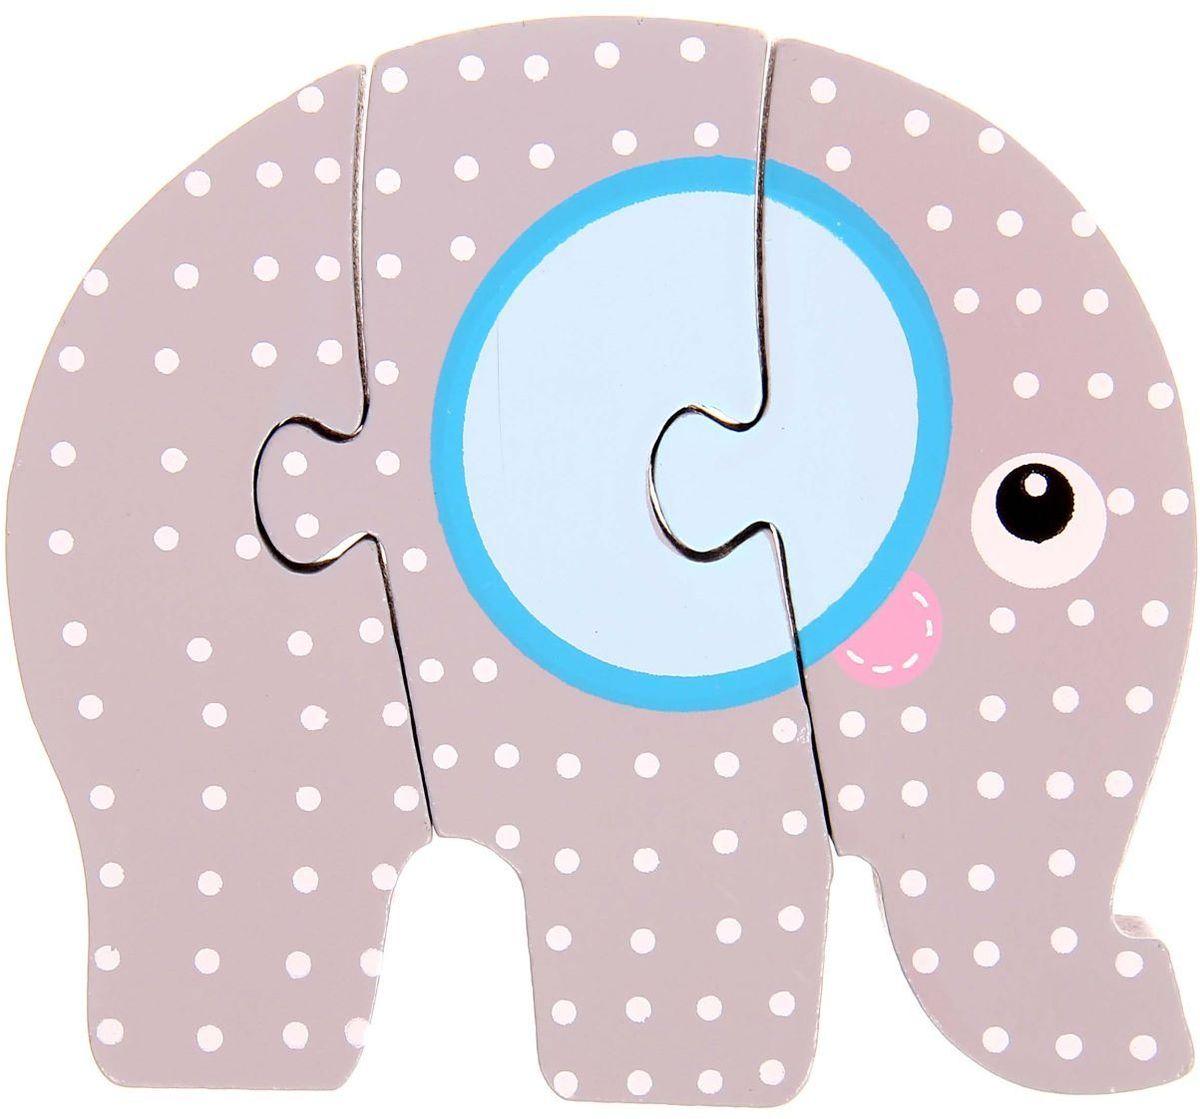 Лесная мастерская Пазл для малышей Слон 1160411 цены онлайн